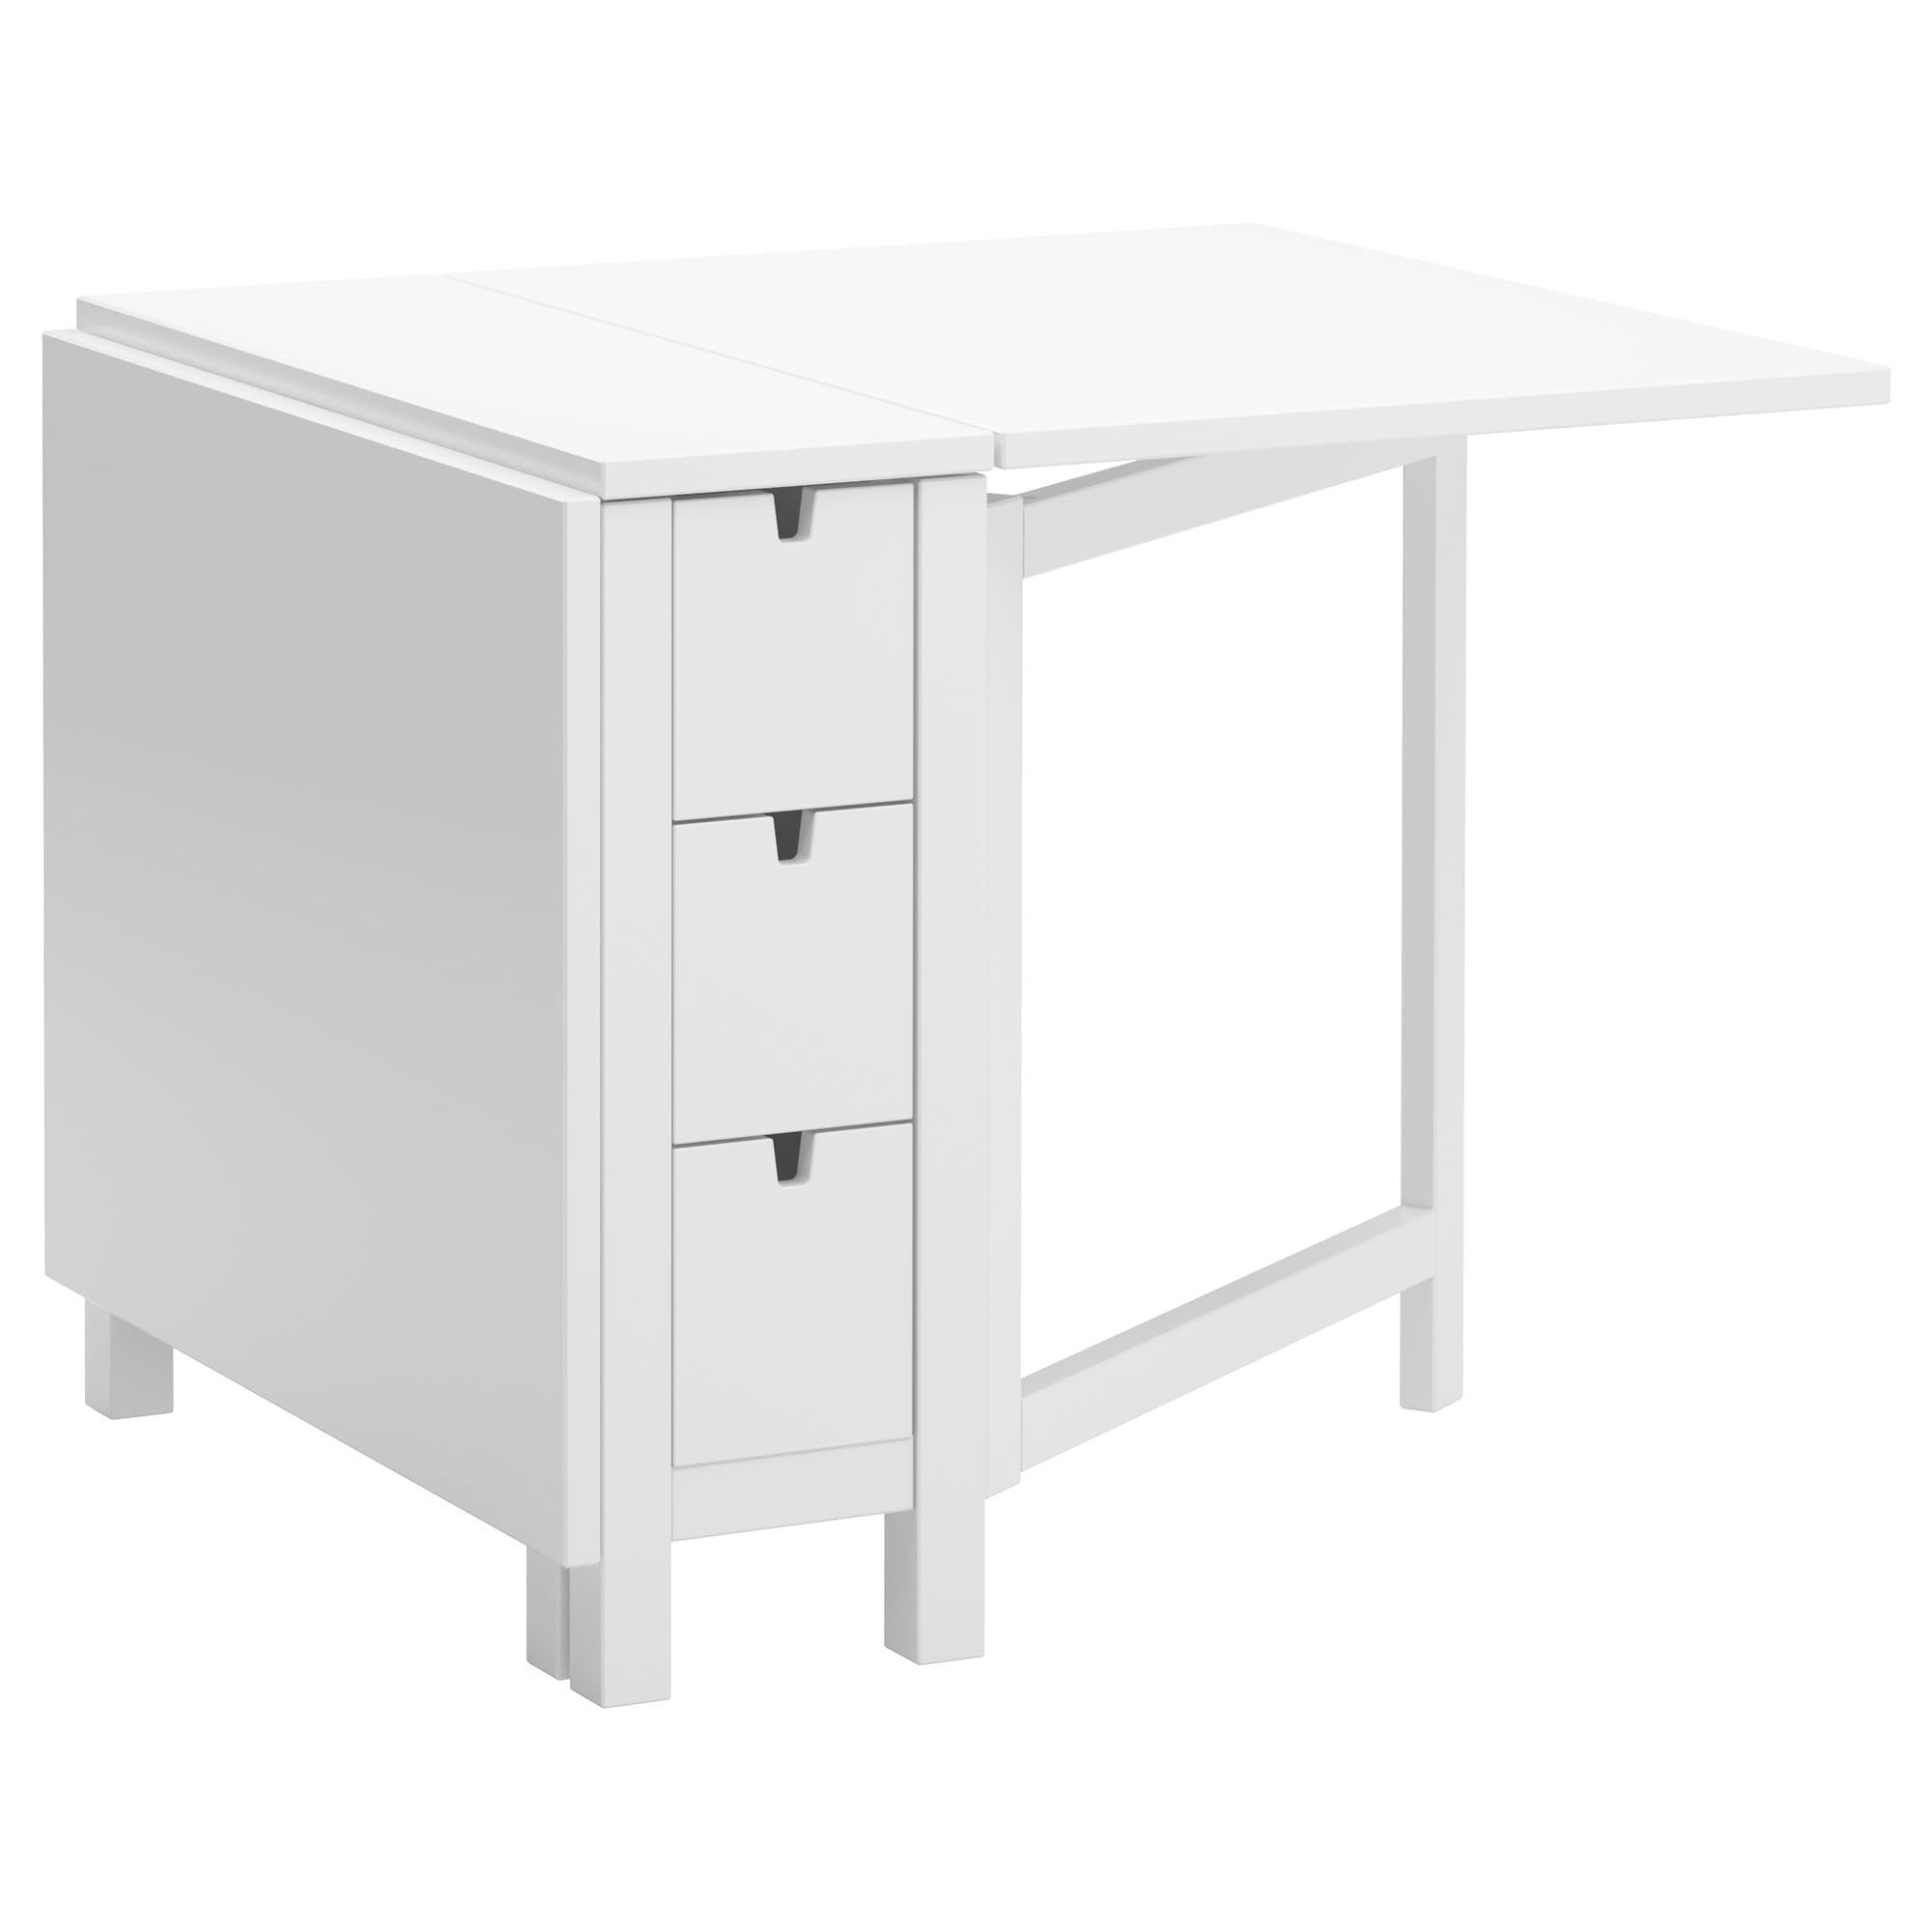 Mesas De Comedor Extensibles Ikea D0dg Mesas De Edor Pra Online Ikea